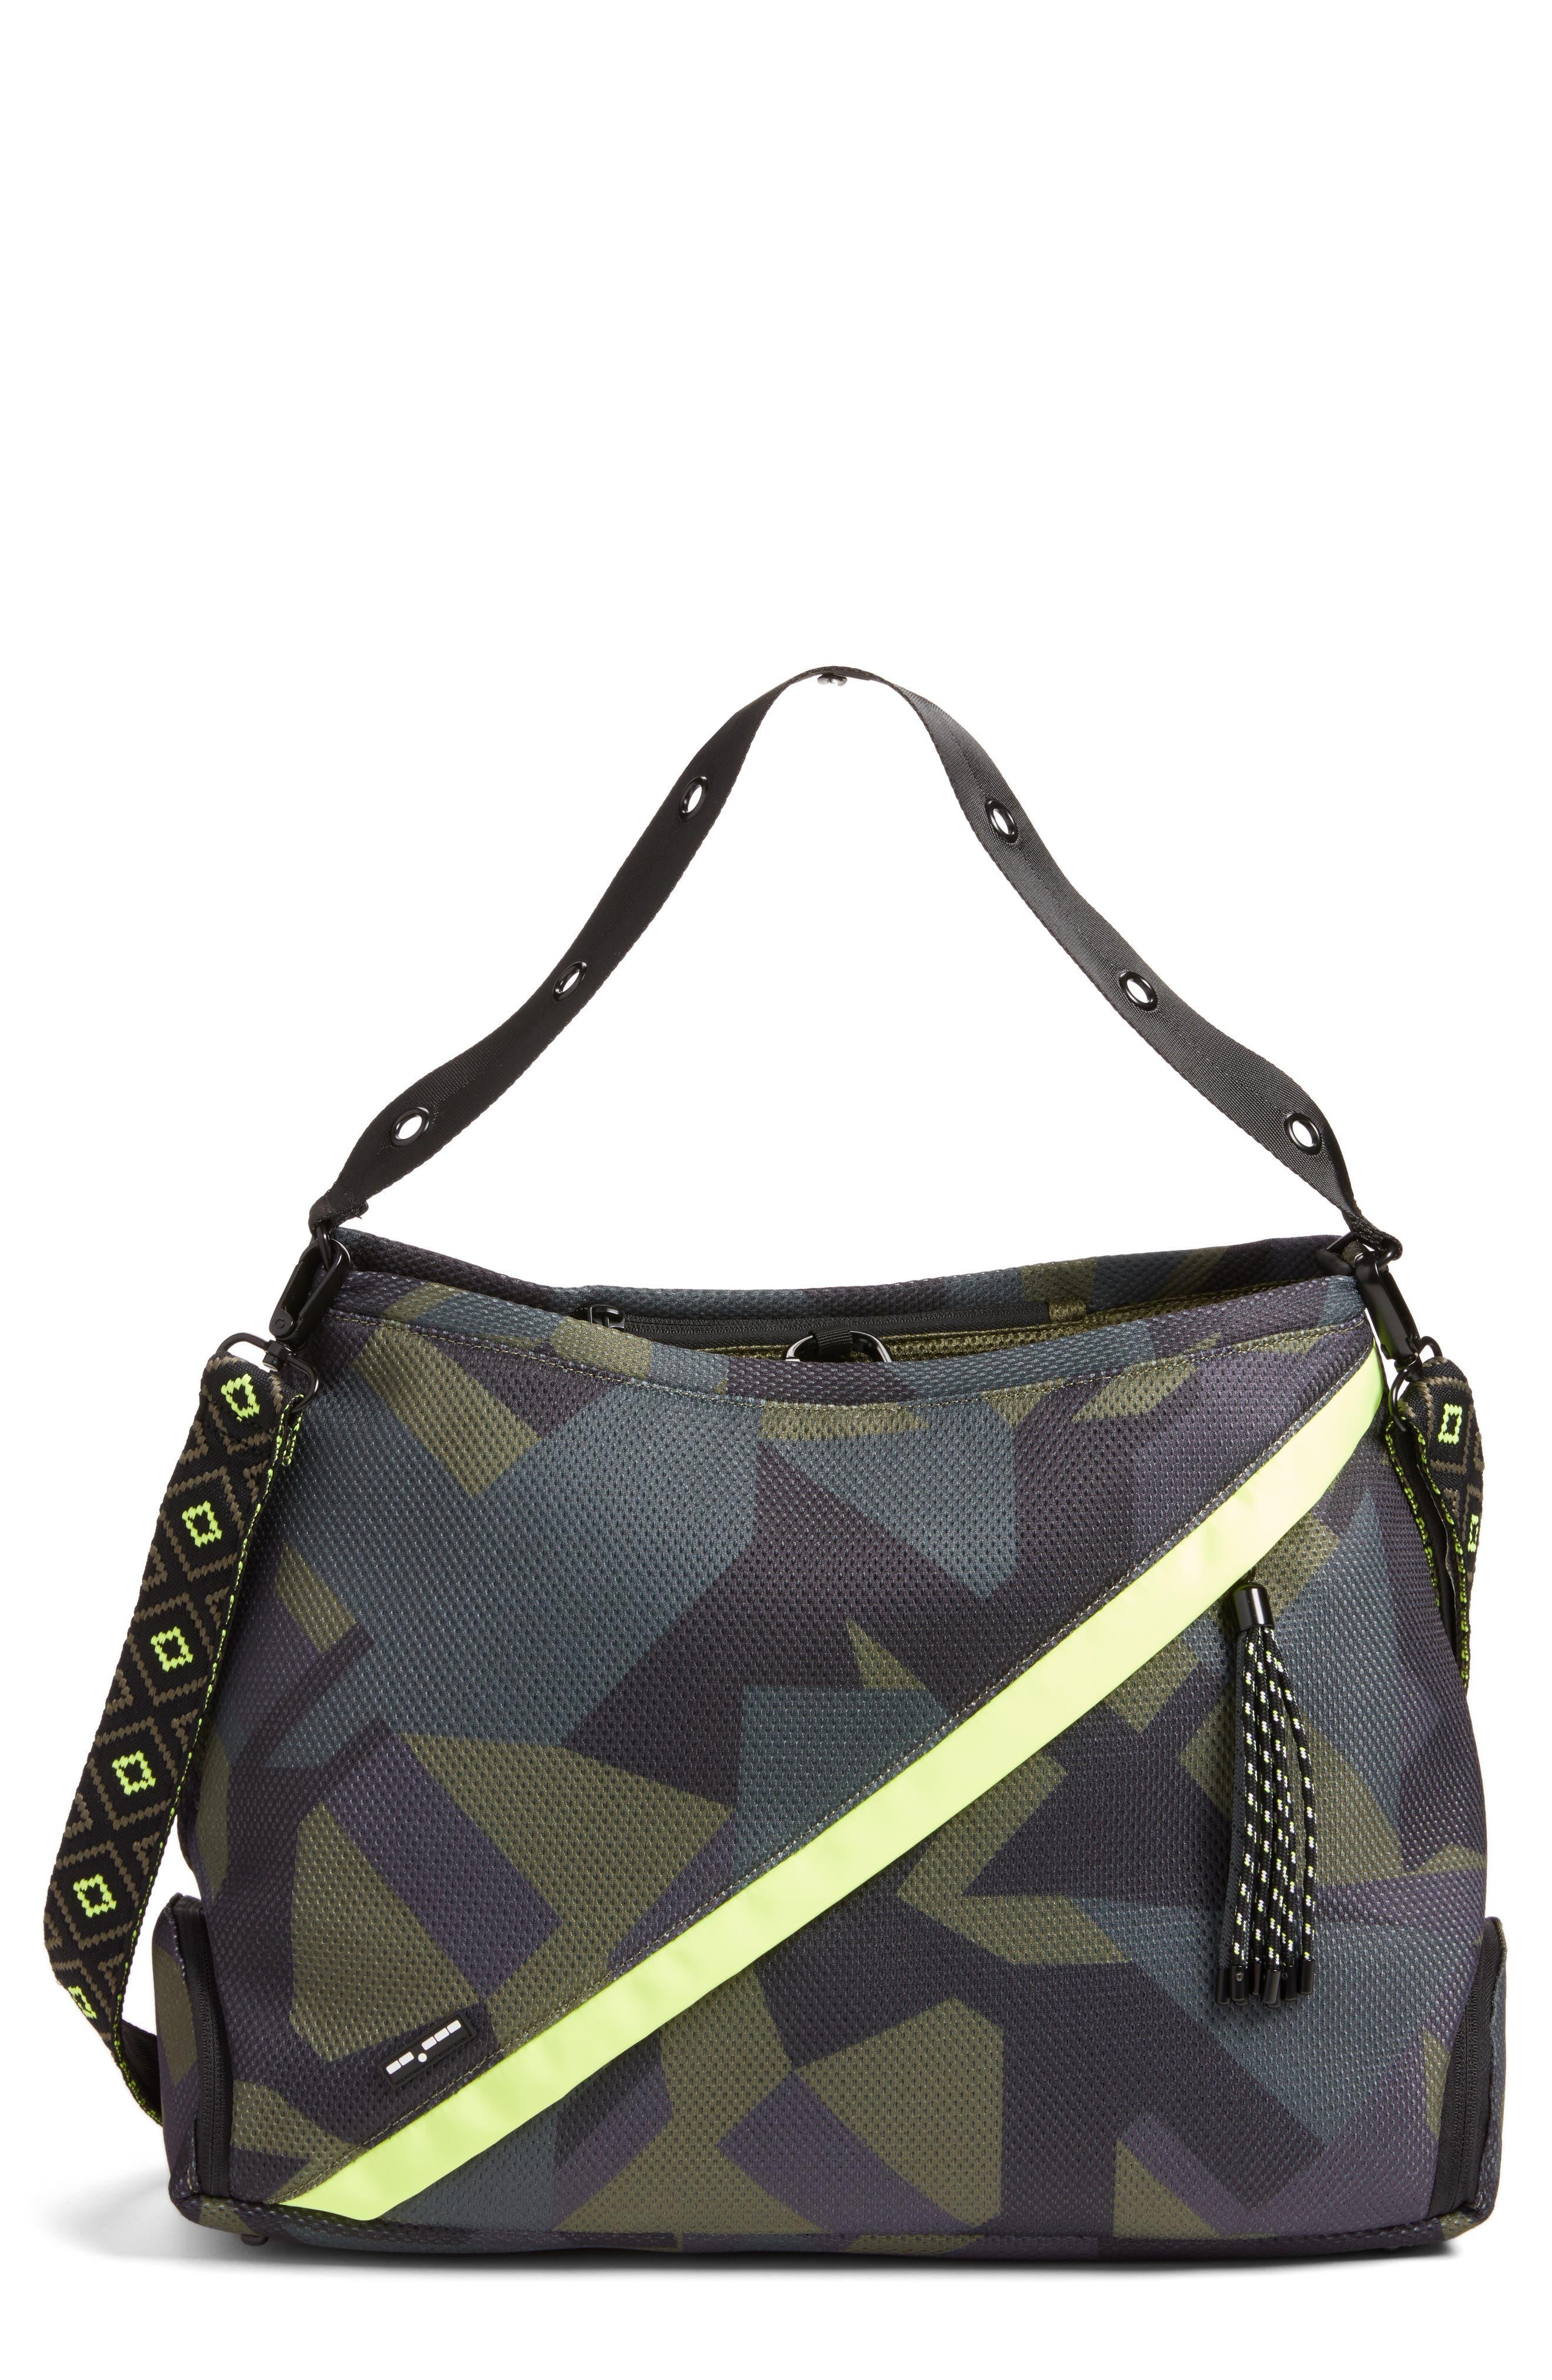 Go Dash Dot Infinity Water Resistant Bag